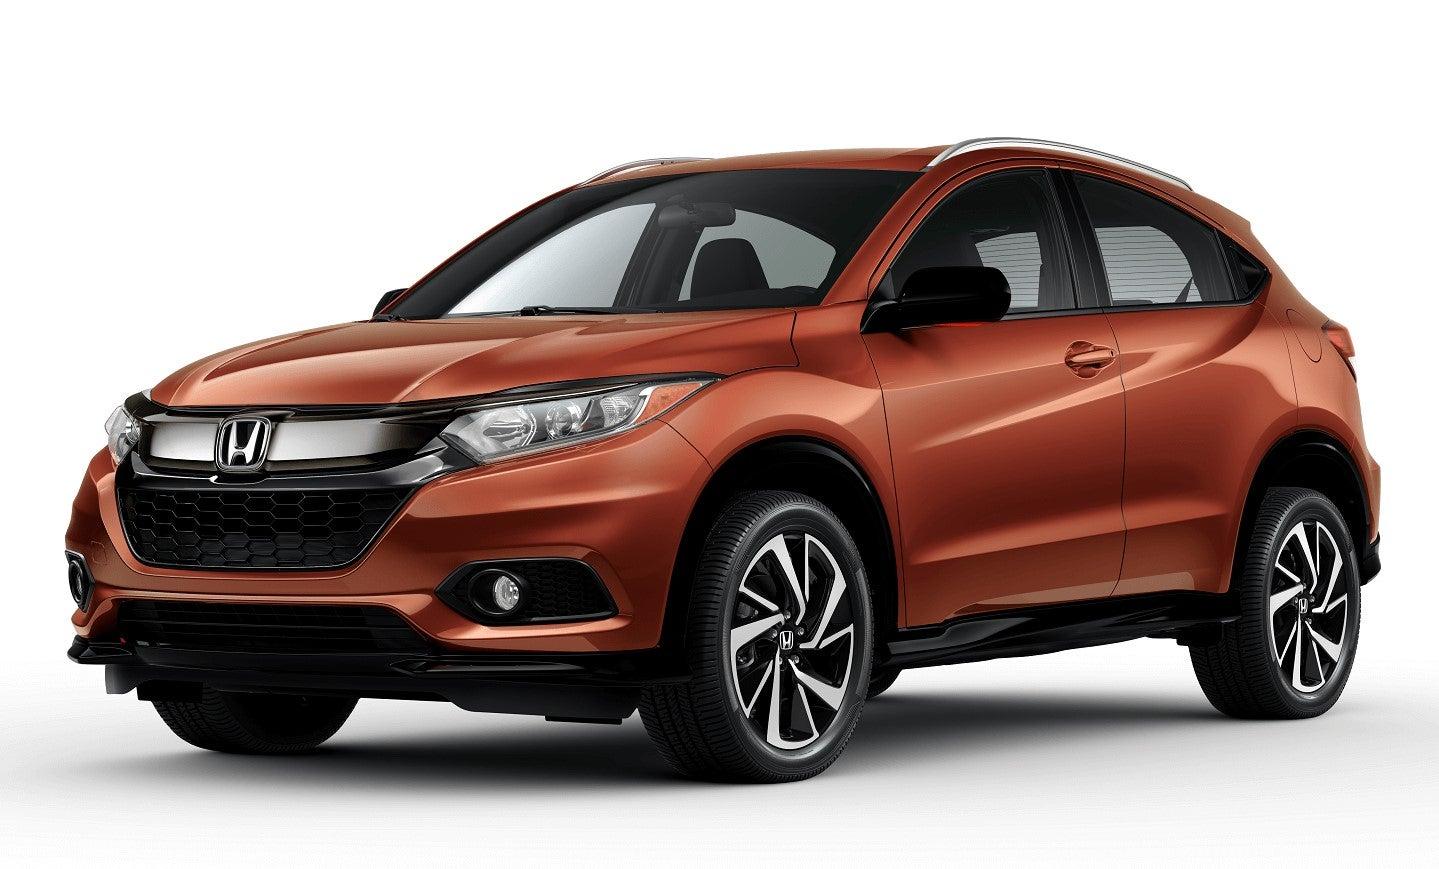 Honda HR-V vs Mazda CX-5 Harrisburg PA